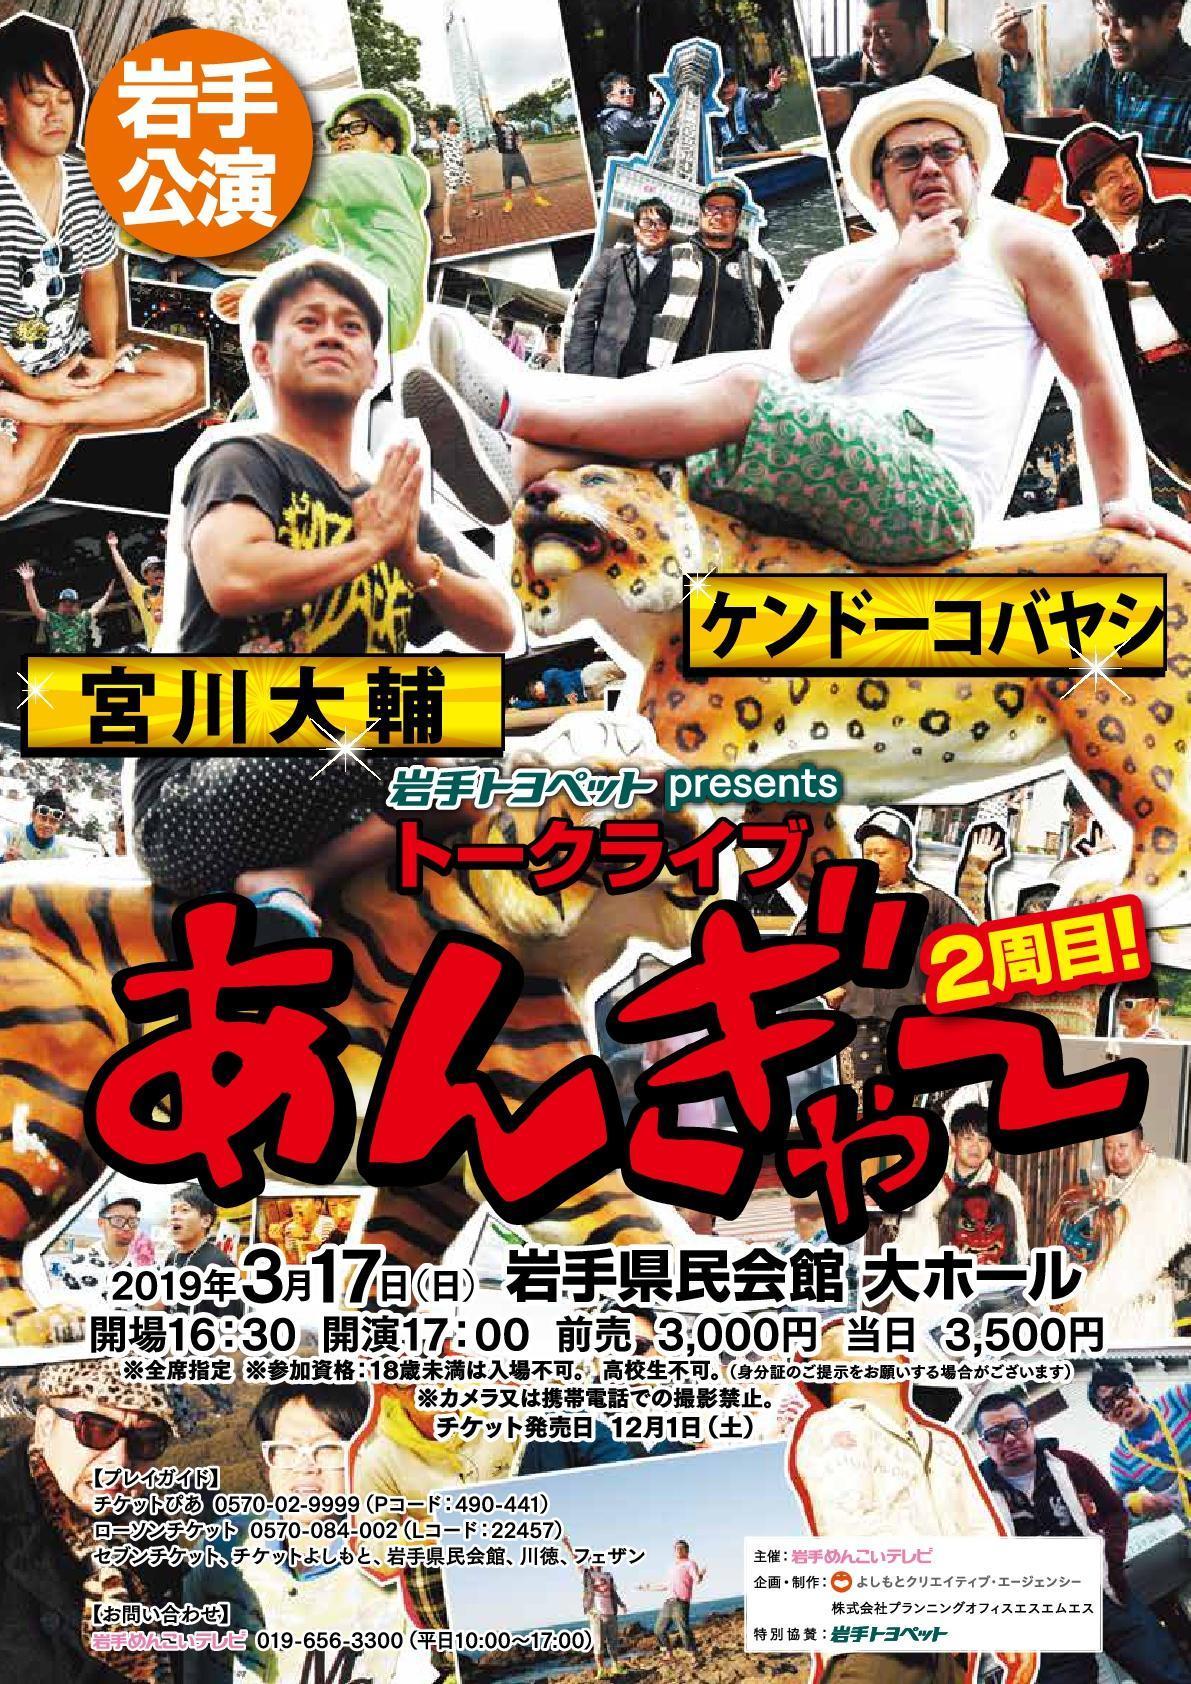 http://www.syumatsu.jp/20181115115631-7c425ad43a03967ff94b830ed1b60e36728418d1.jpg